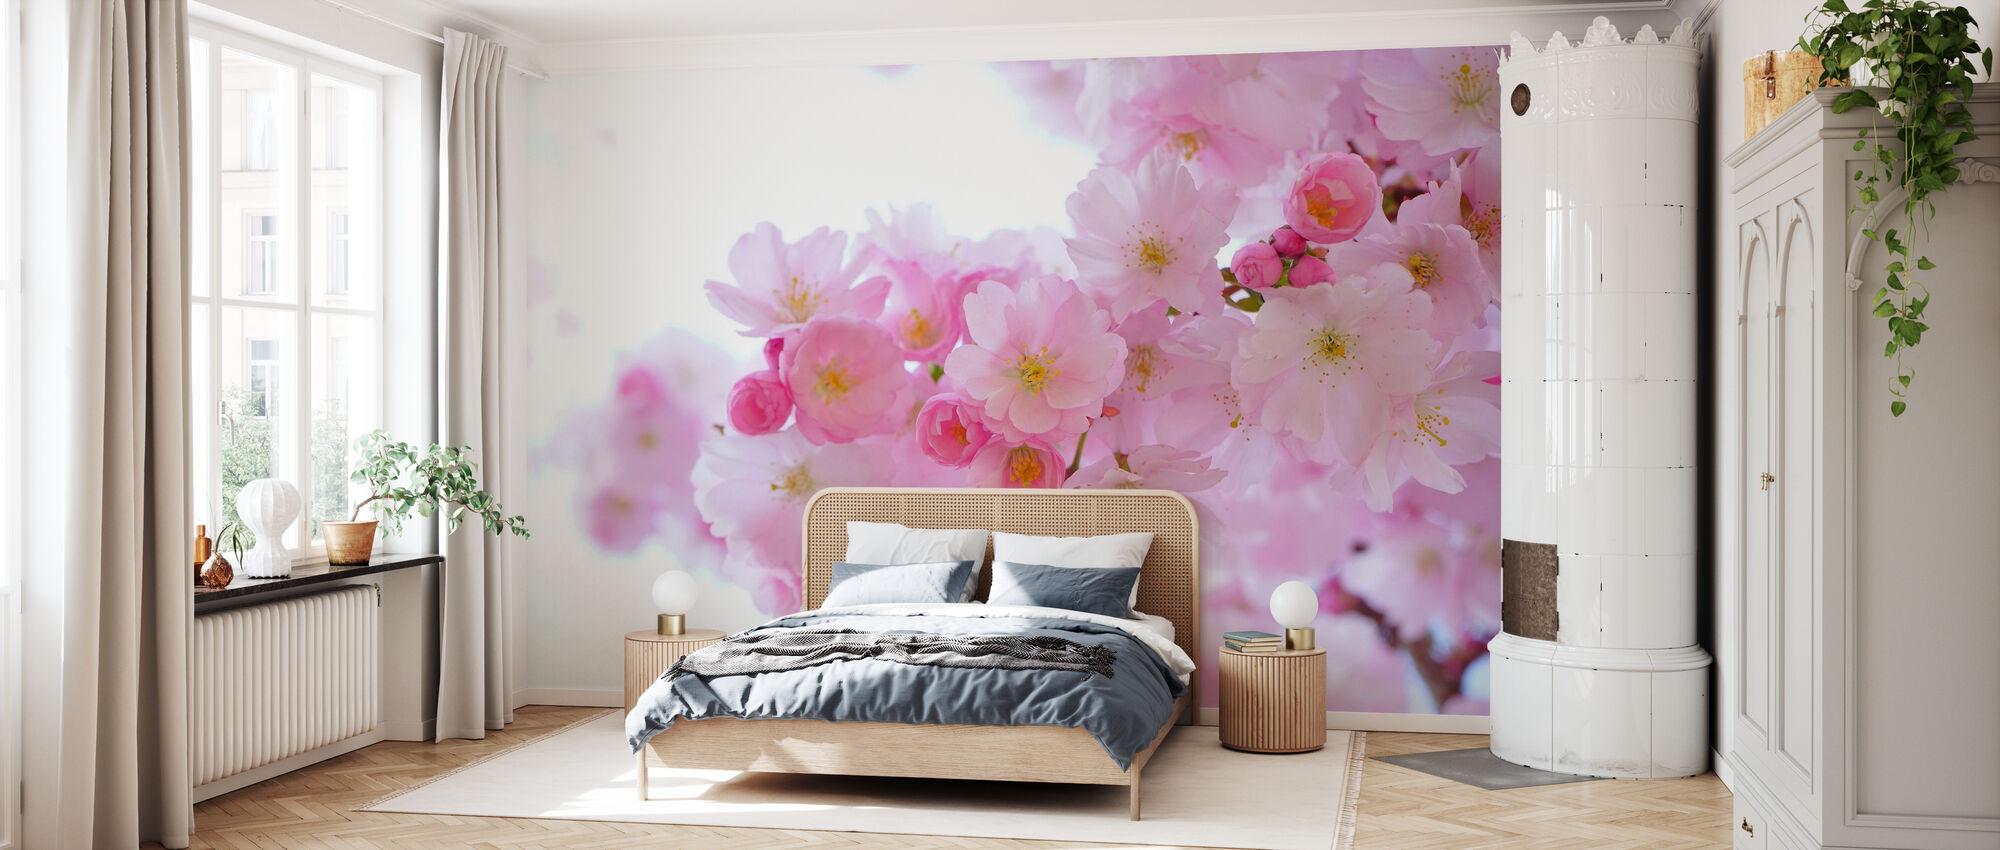 Blossom kirsikankukka - Tapetti - Makuuhuone